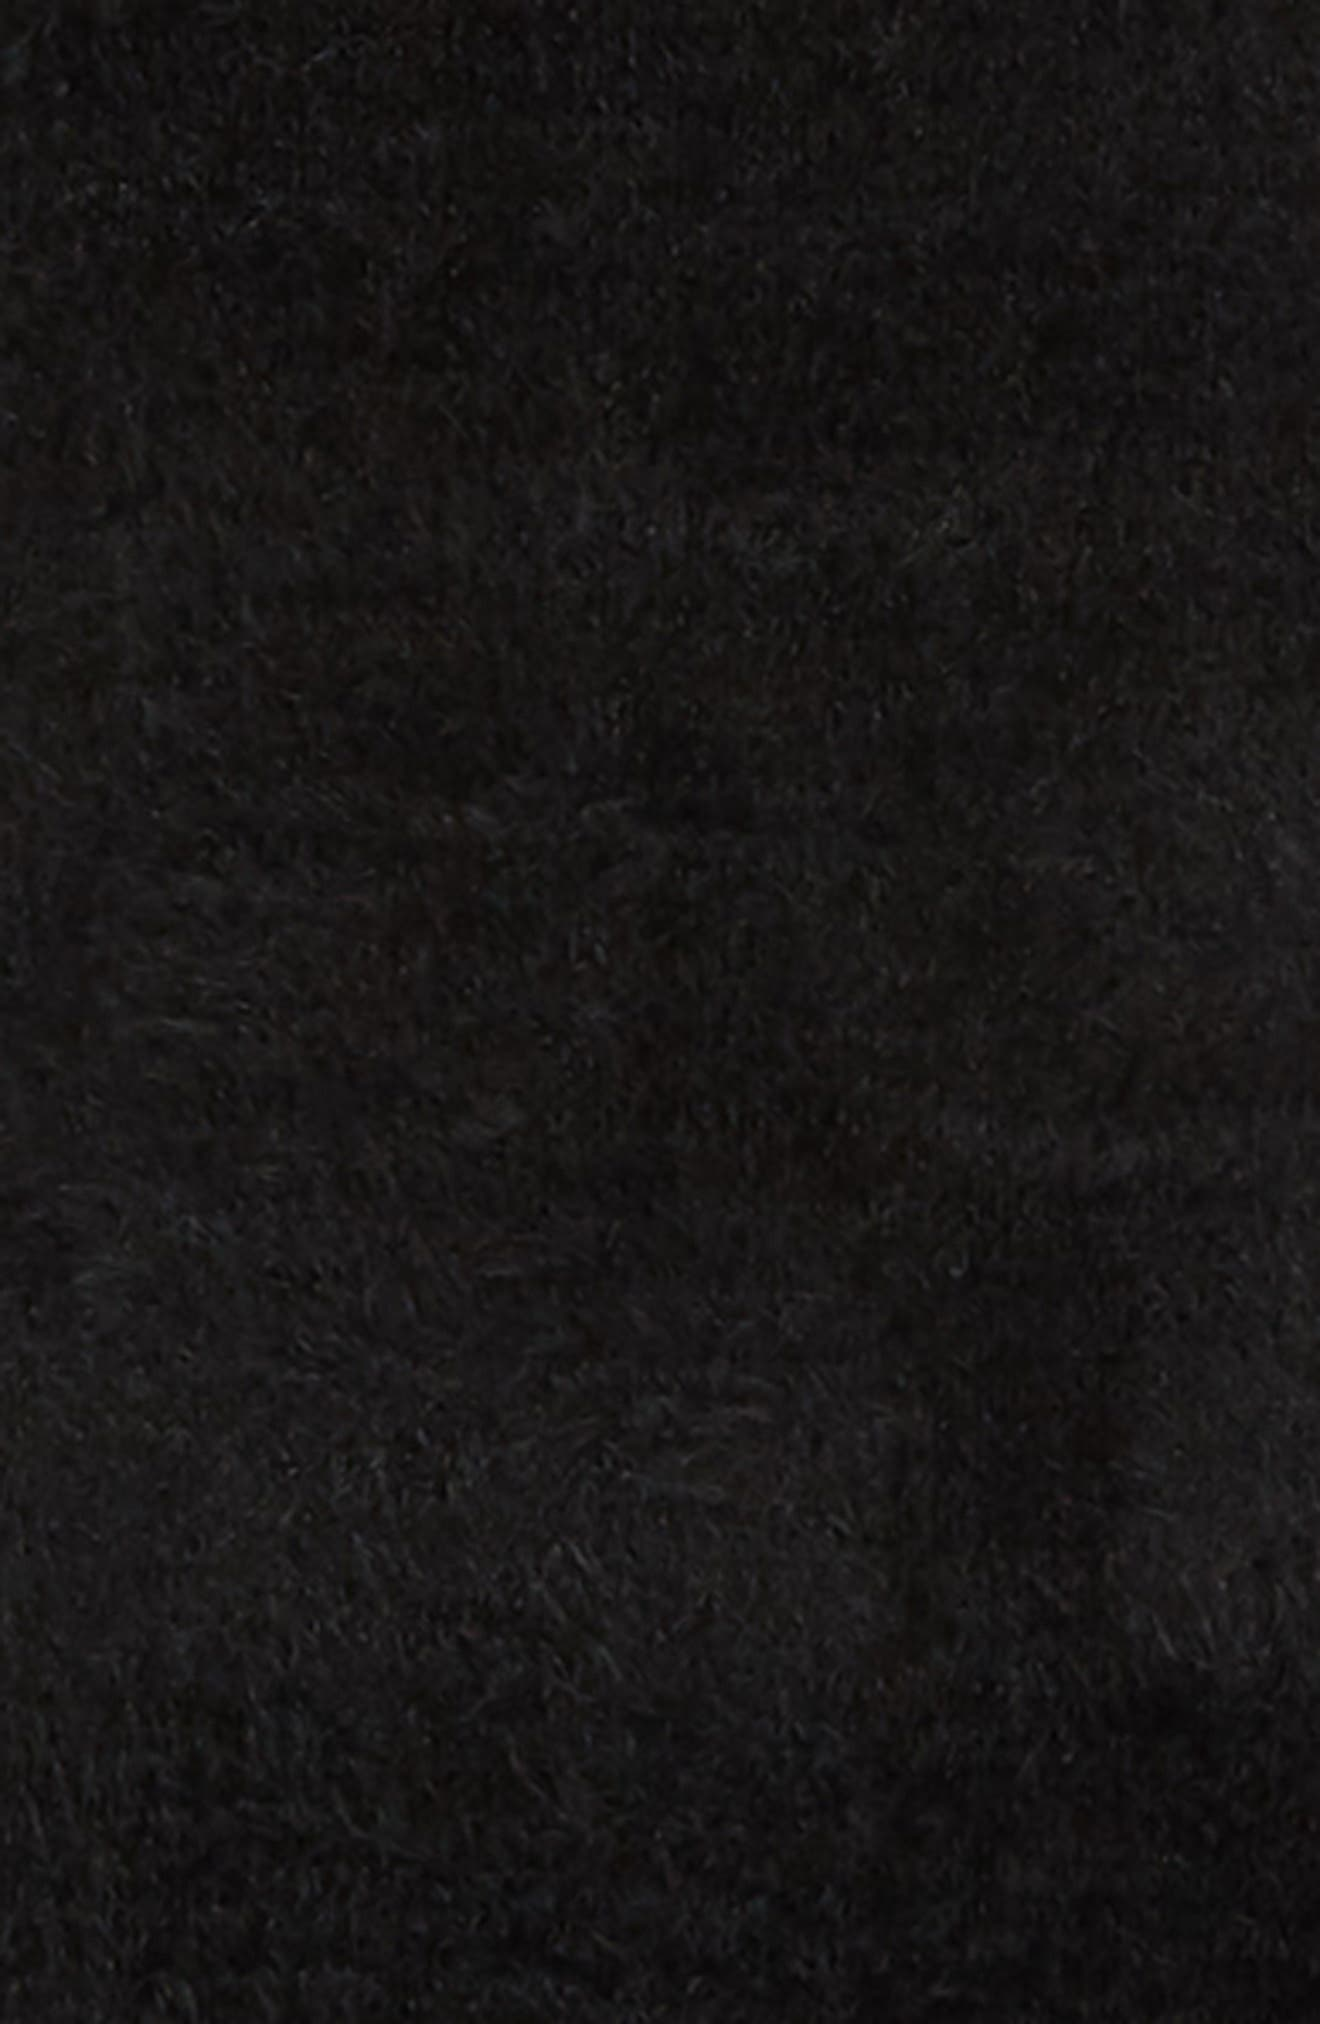 Eyleash Knit Muffler,                             Alternate thumbnail 4, color,                             001